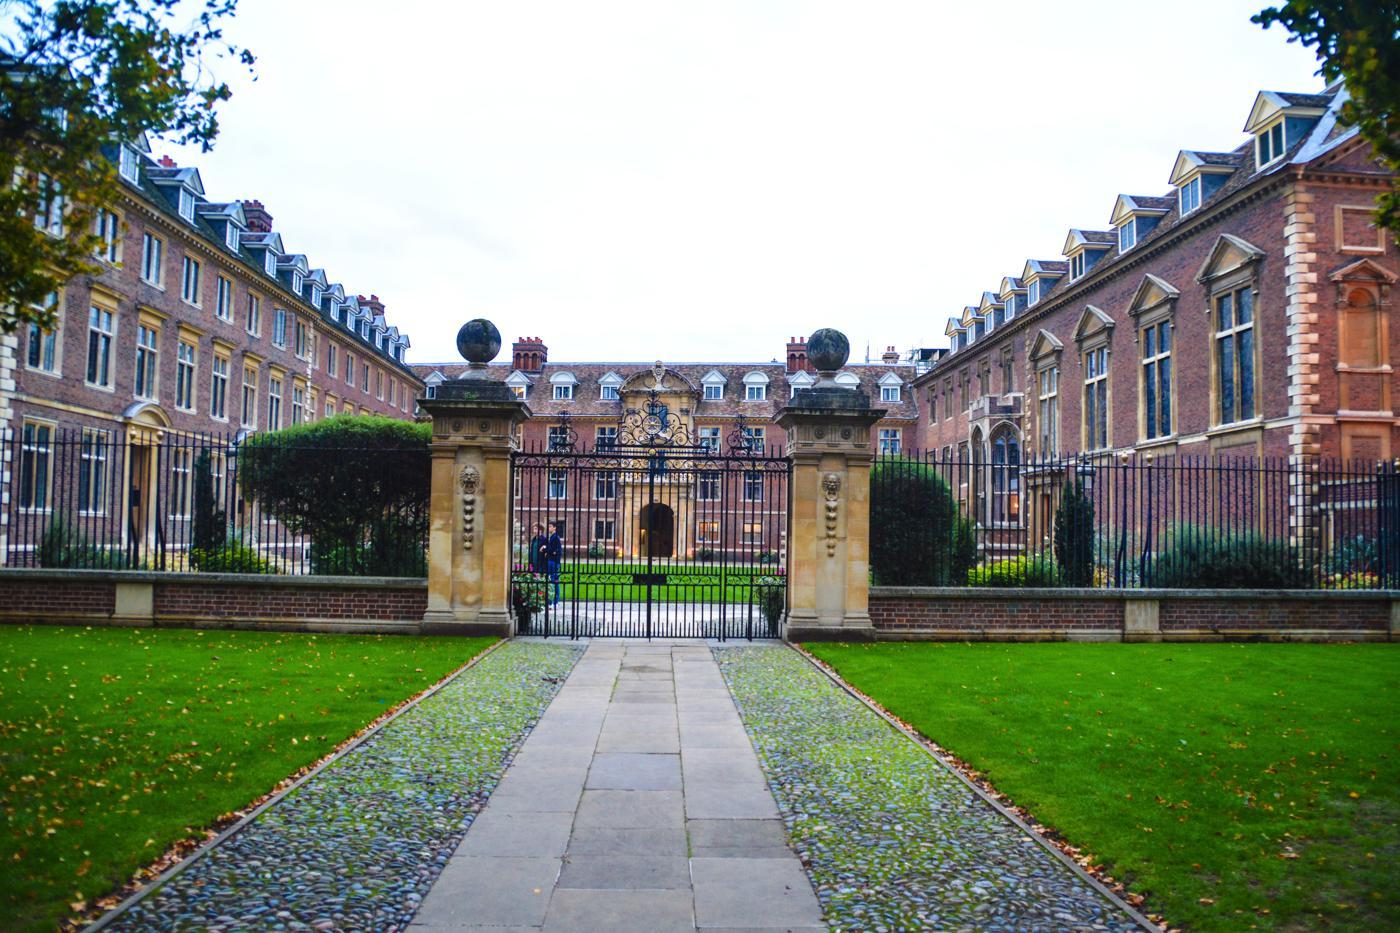 The University of Cambridge, Graduation, Senate House, Cambridge, England (6)